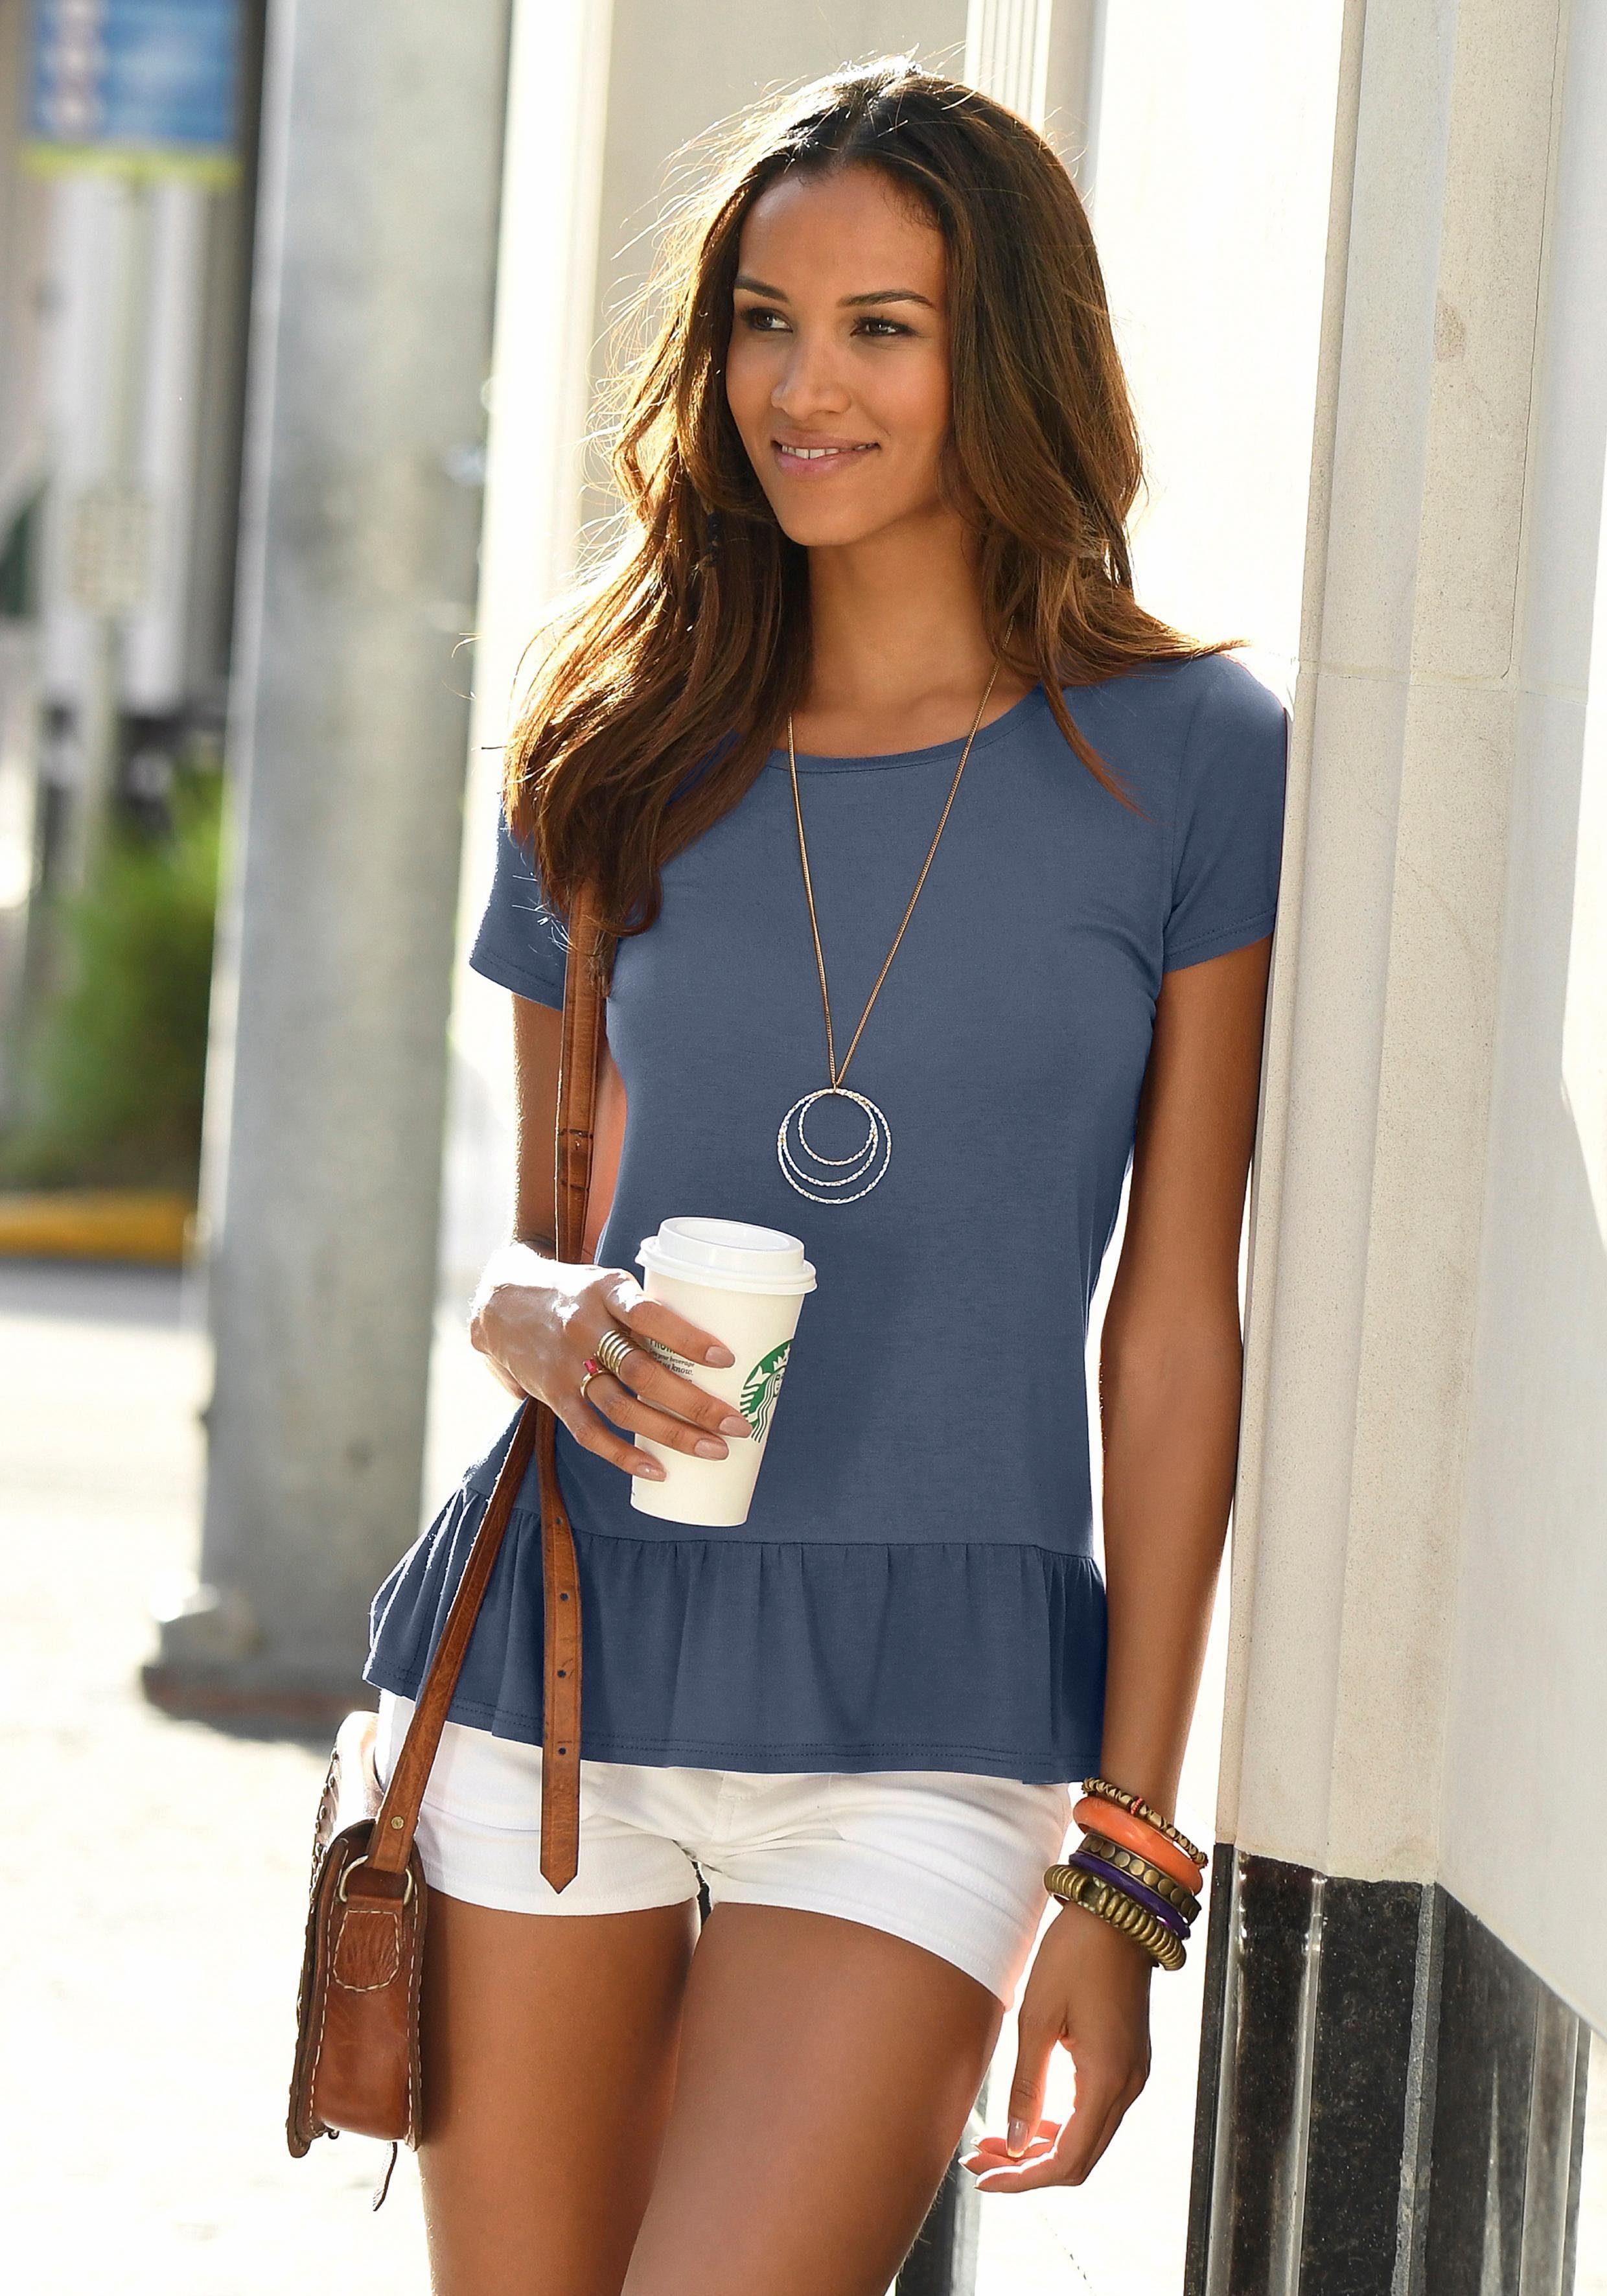 Damen LASCANA T-Shirt mit Volantsaum blau | 06093695654027, 06093717187687